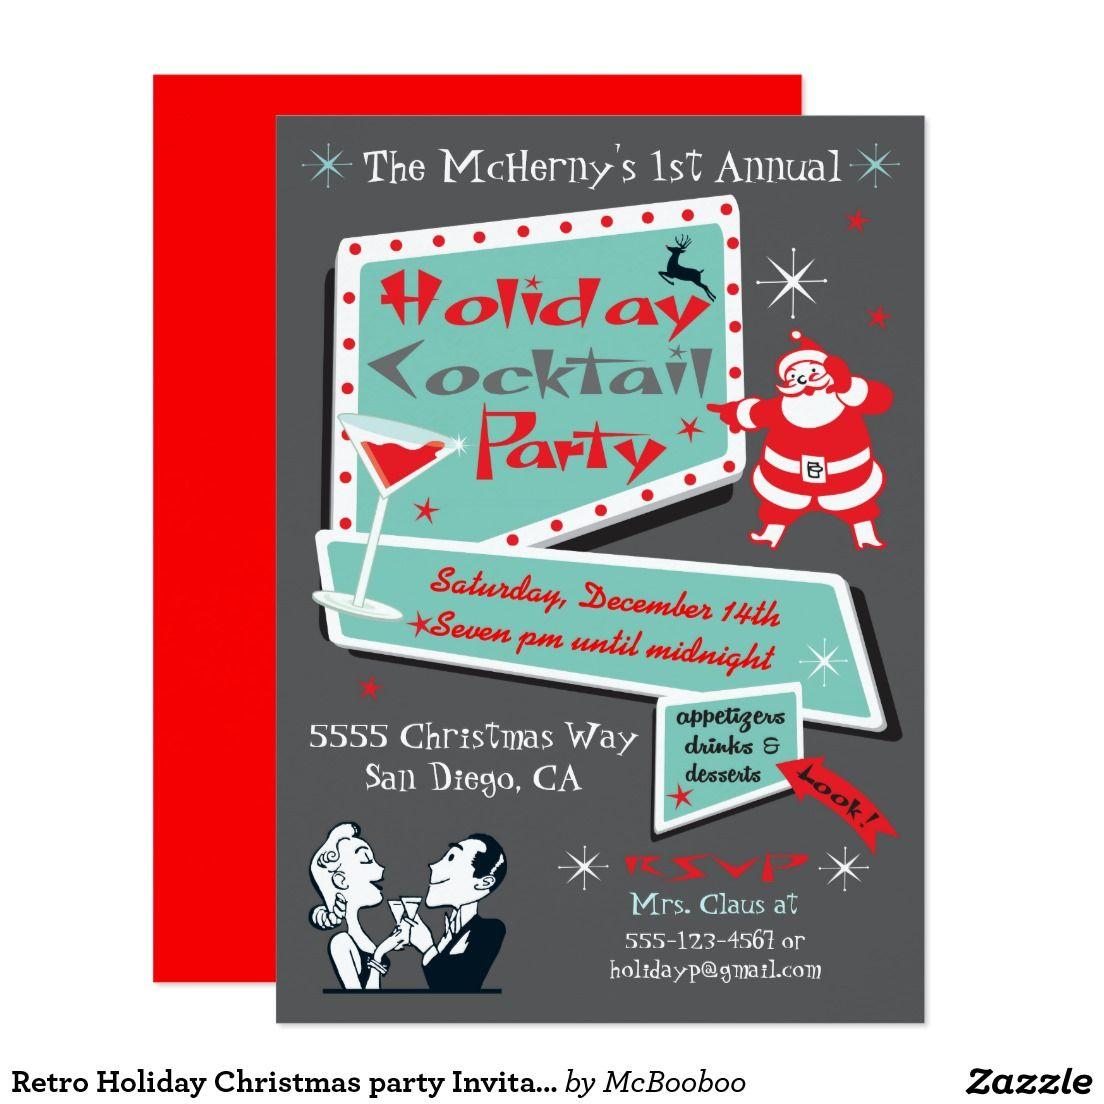 Retro Holiday Christmas party Invitations | Christmas parties ...